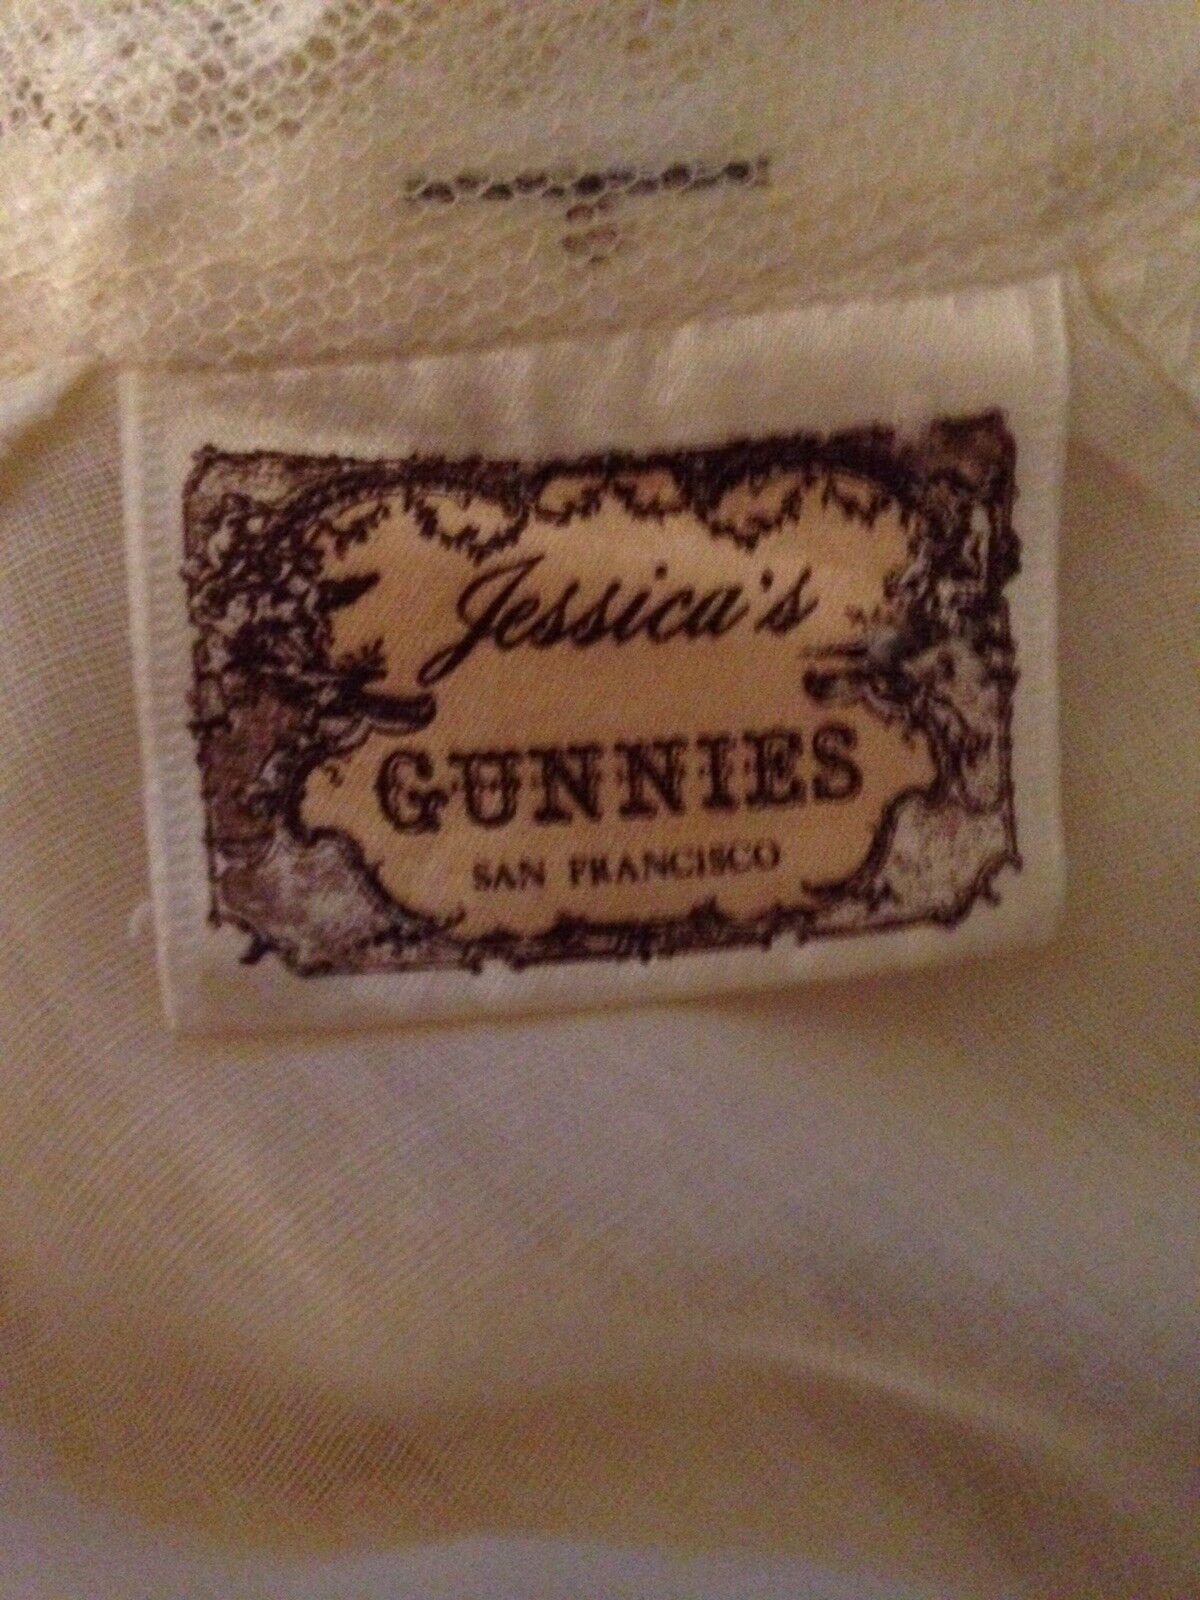 jessicas gunnies vintage blouse - image 12